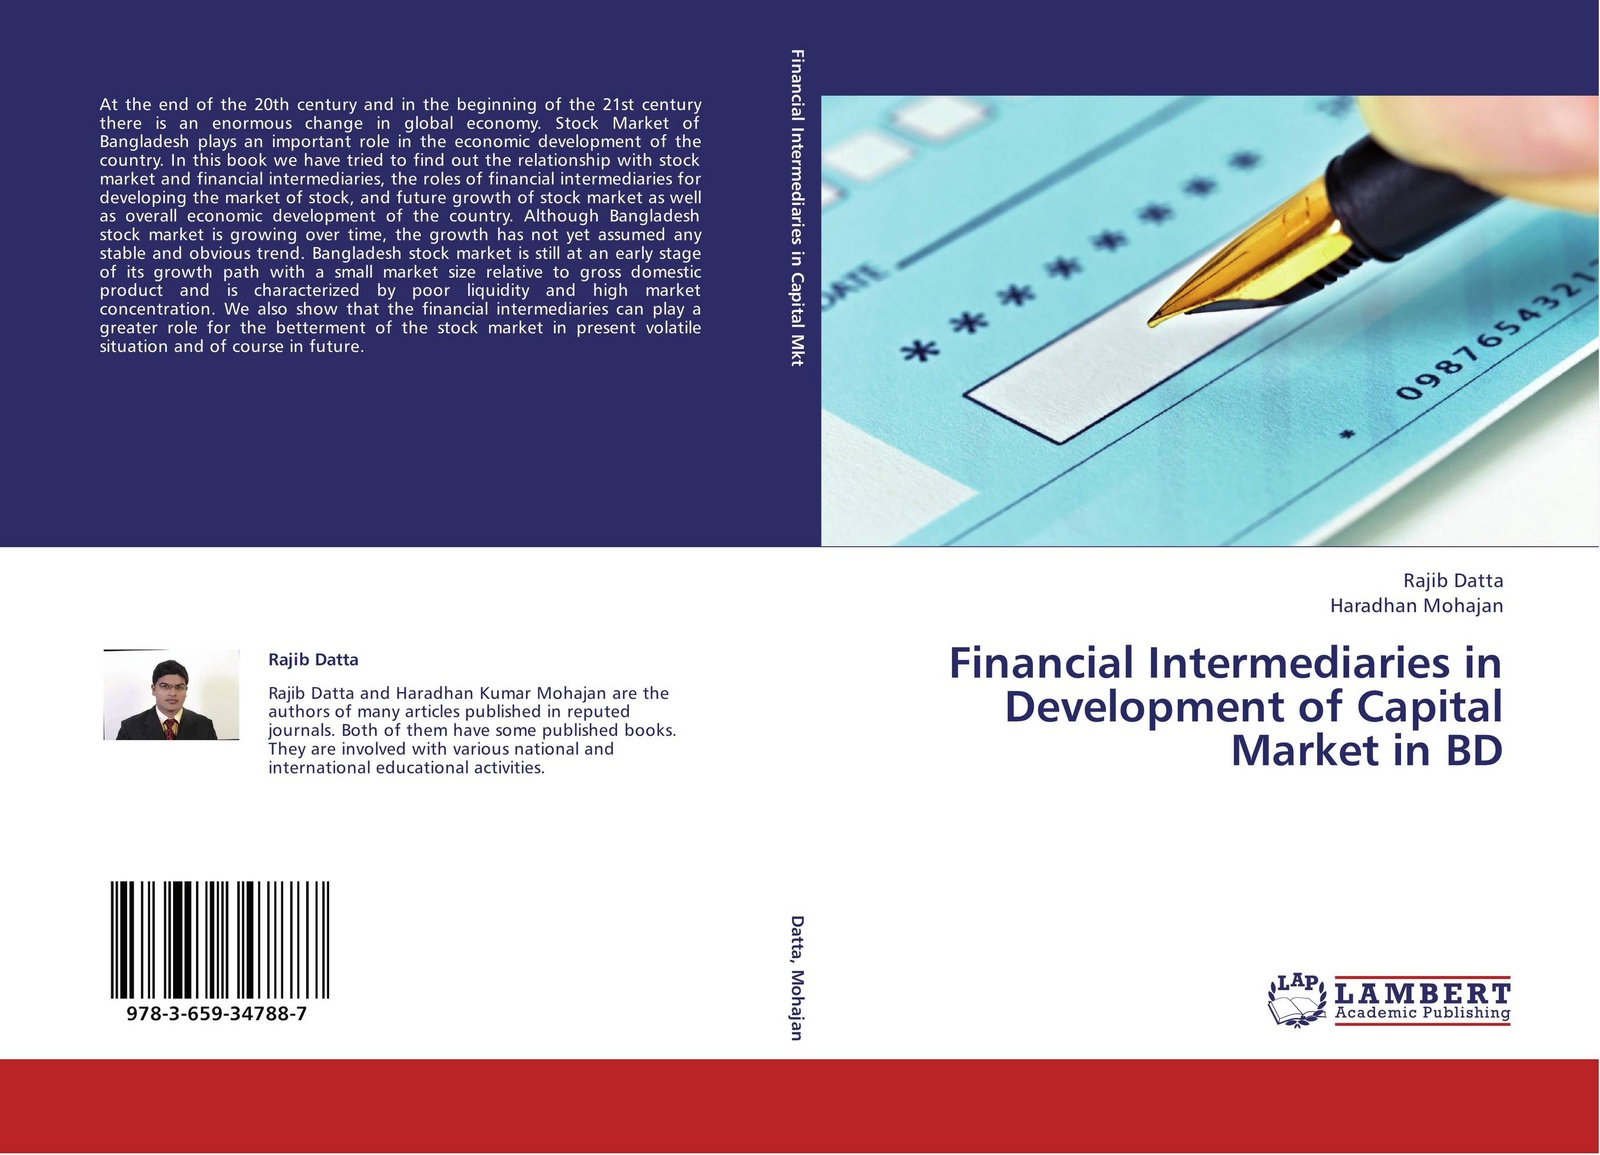 Rajib Datta and Haradhan Mohajan Financial Intermediaries in Development of Capital Market in BD yichen liu financial development and economic growth